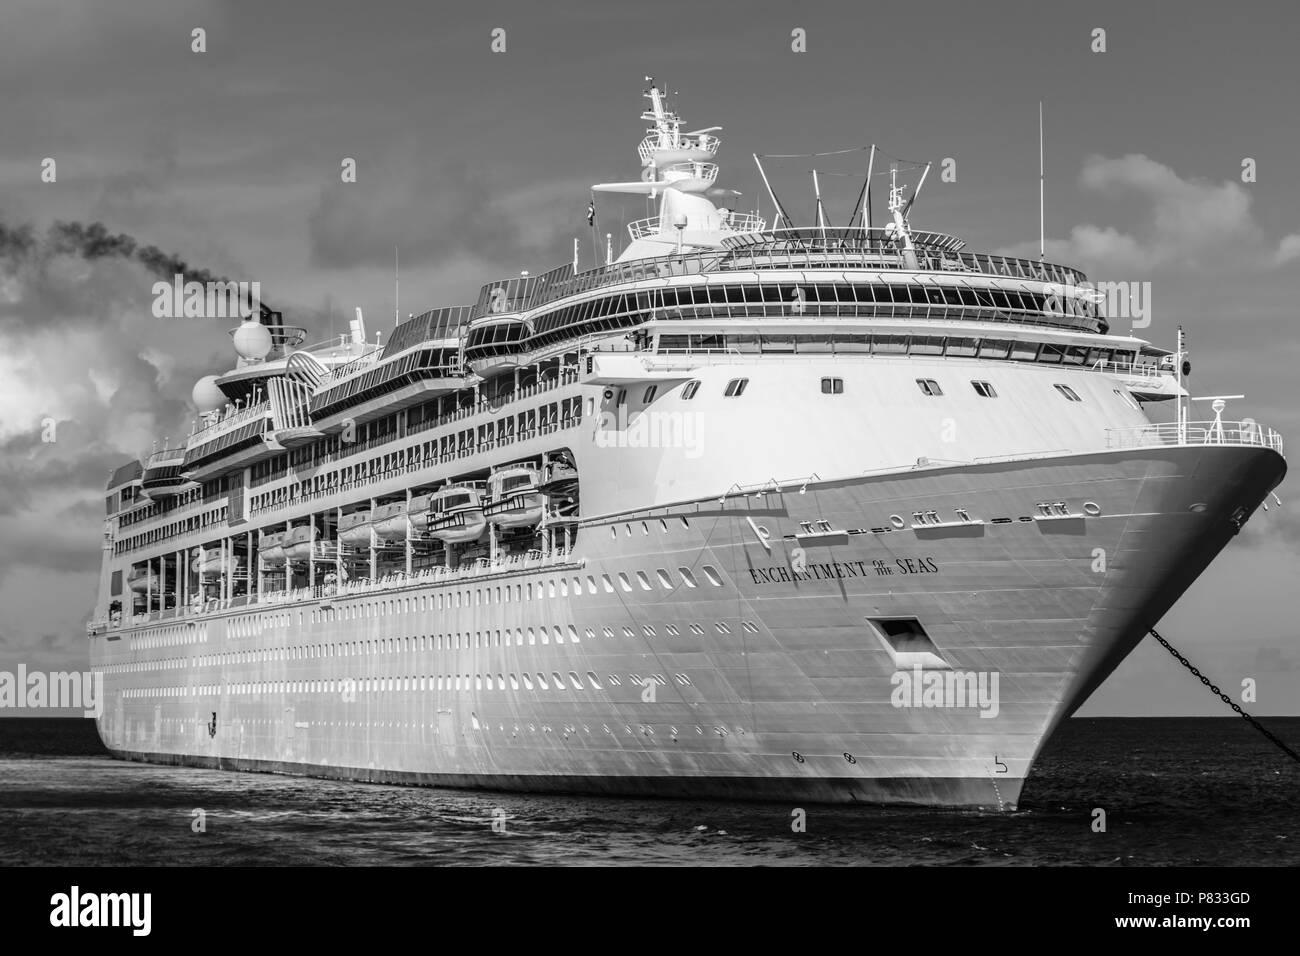 CoCo Cay, Bahamas - December 01 2015: Royal Caribbean Enchantment of the Seas cruise ship. - Stock Image